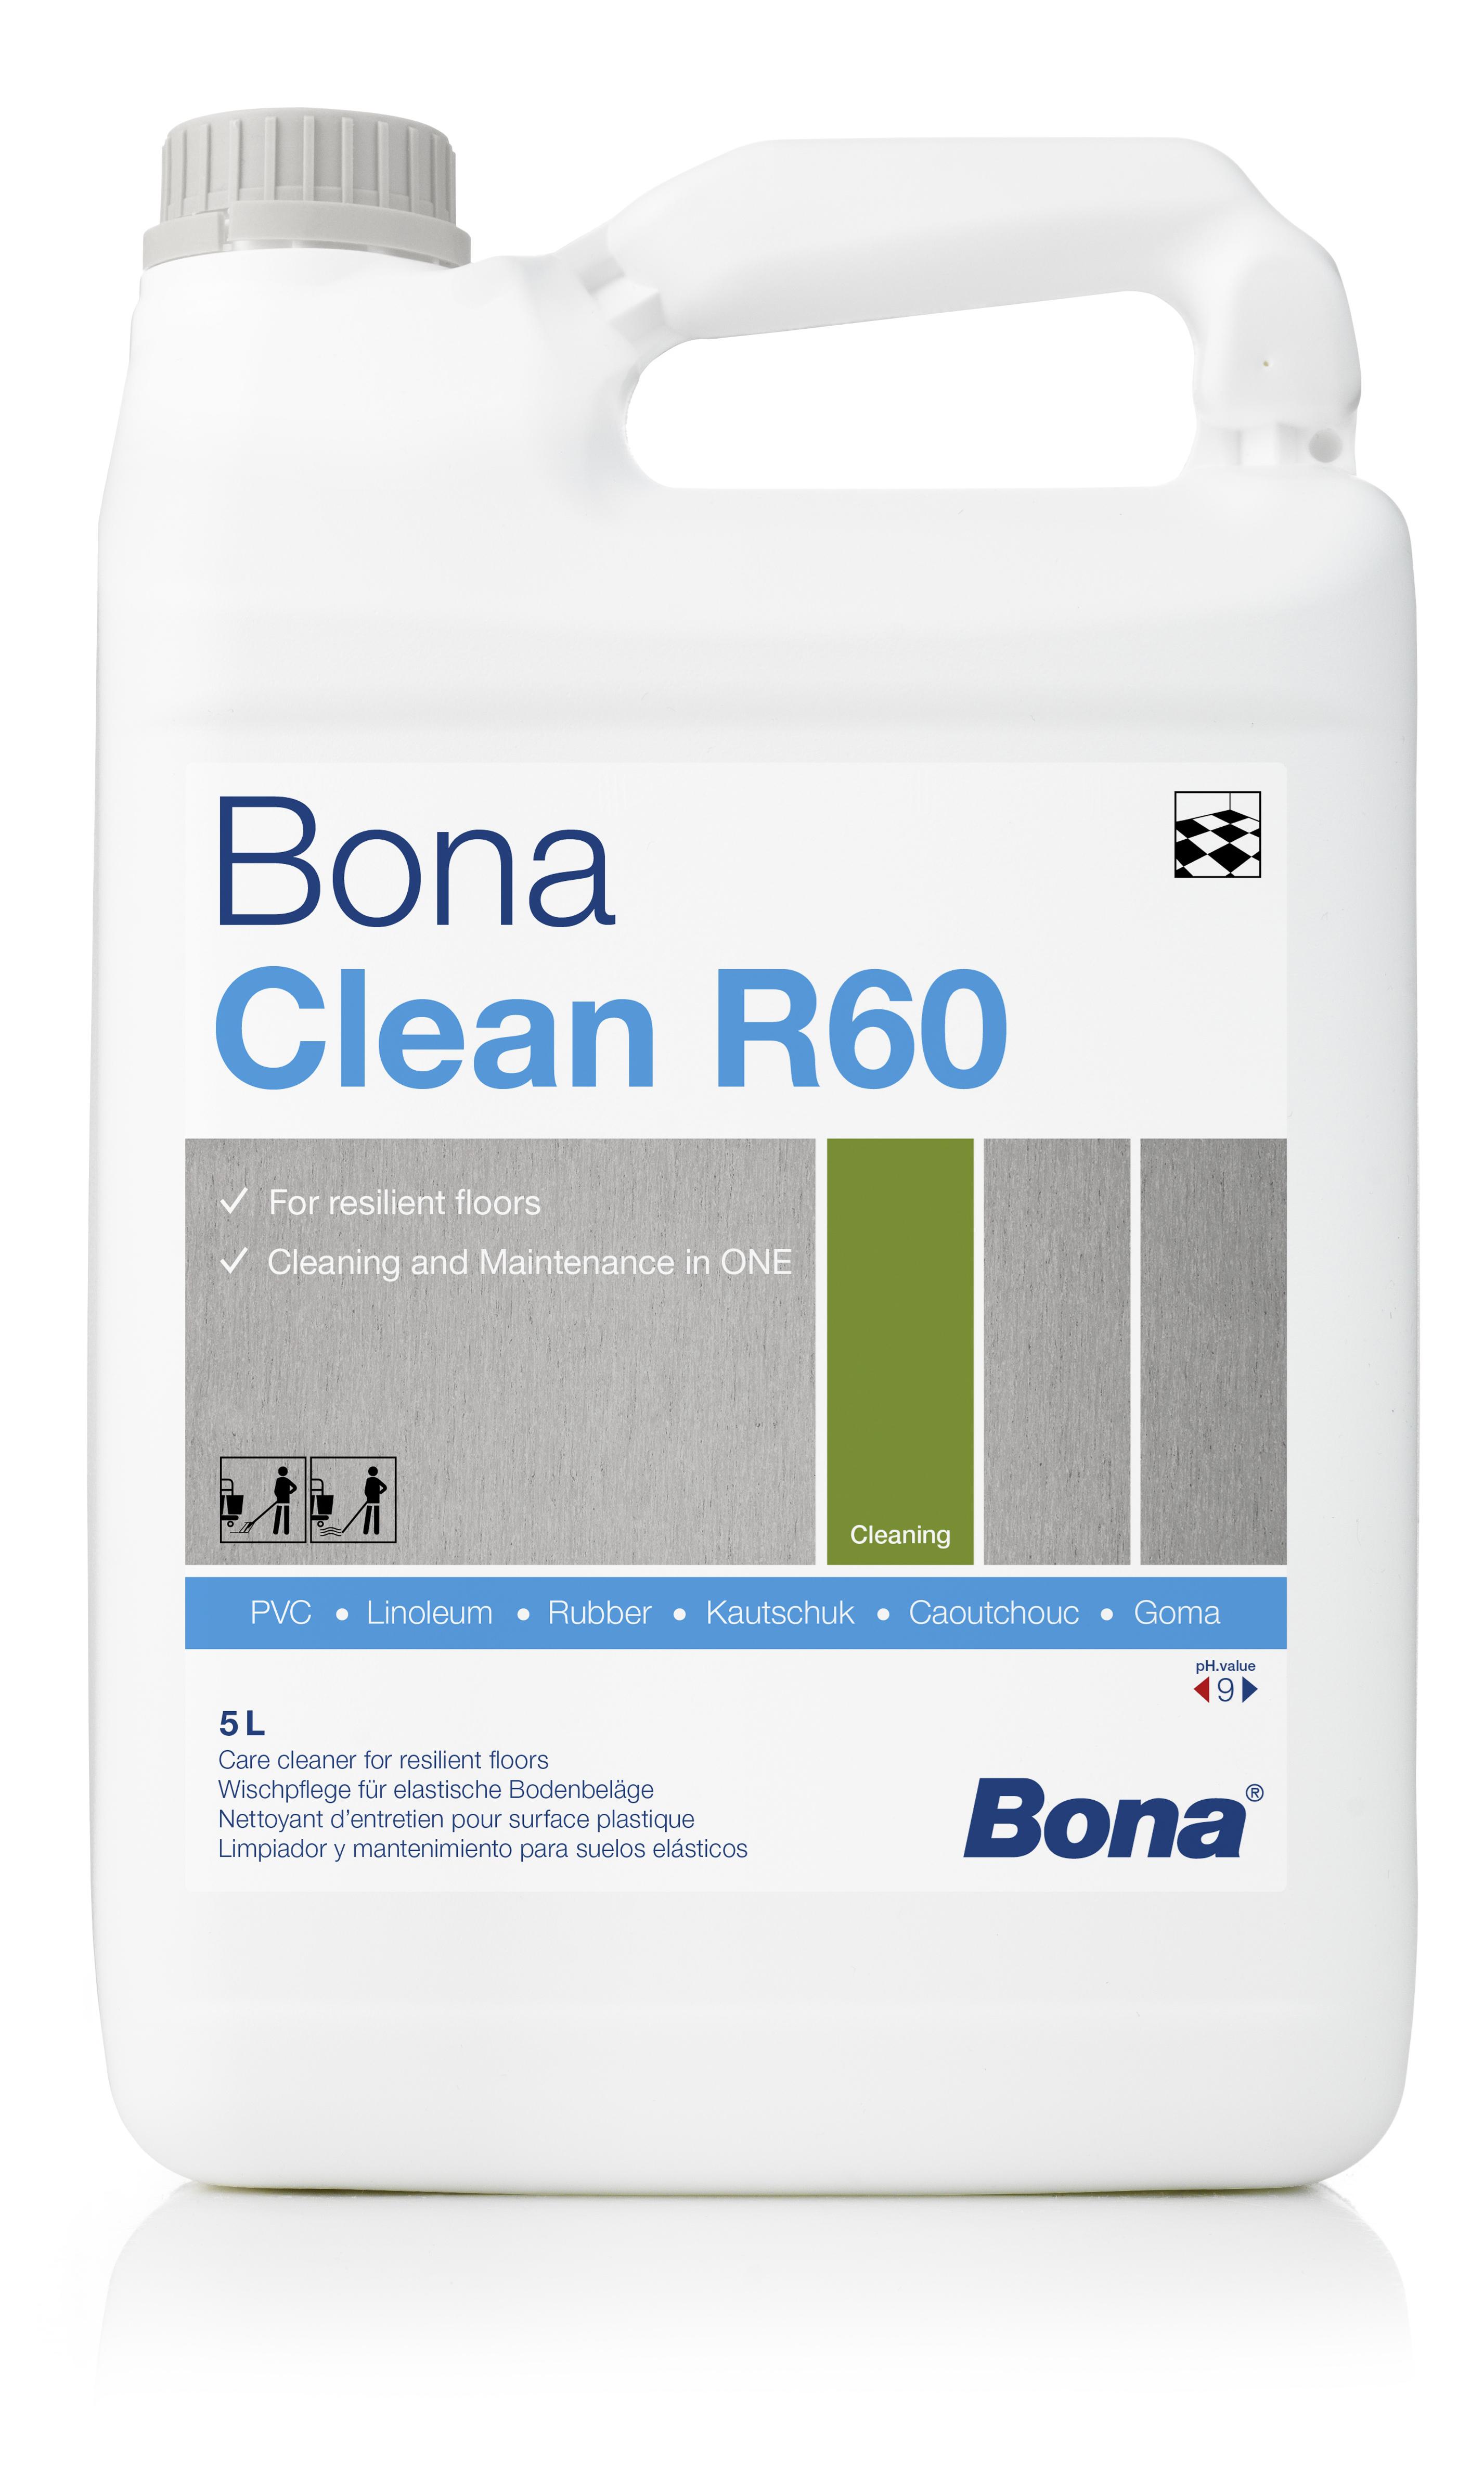 Bona Clean R60